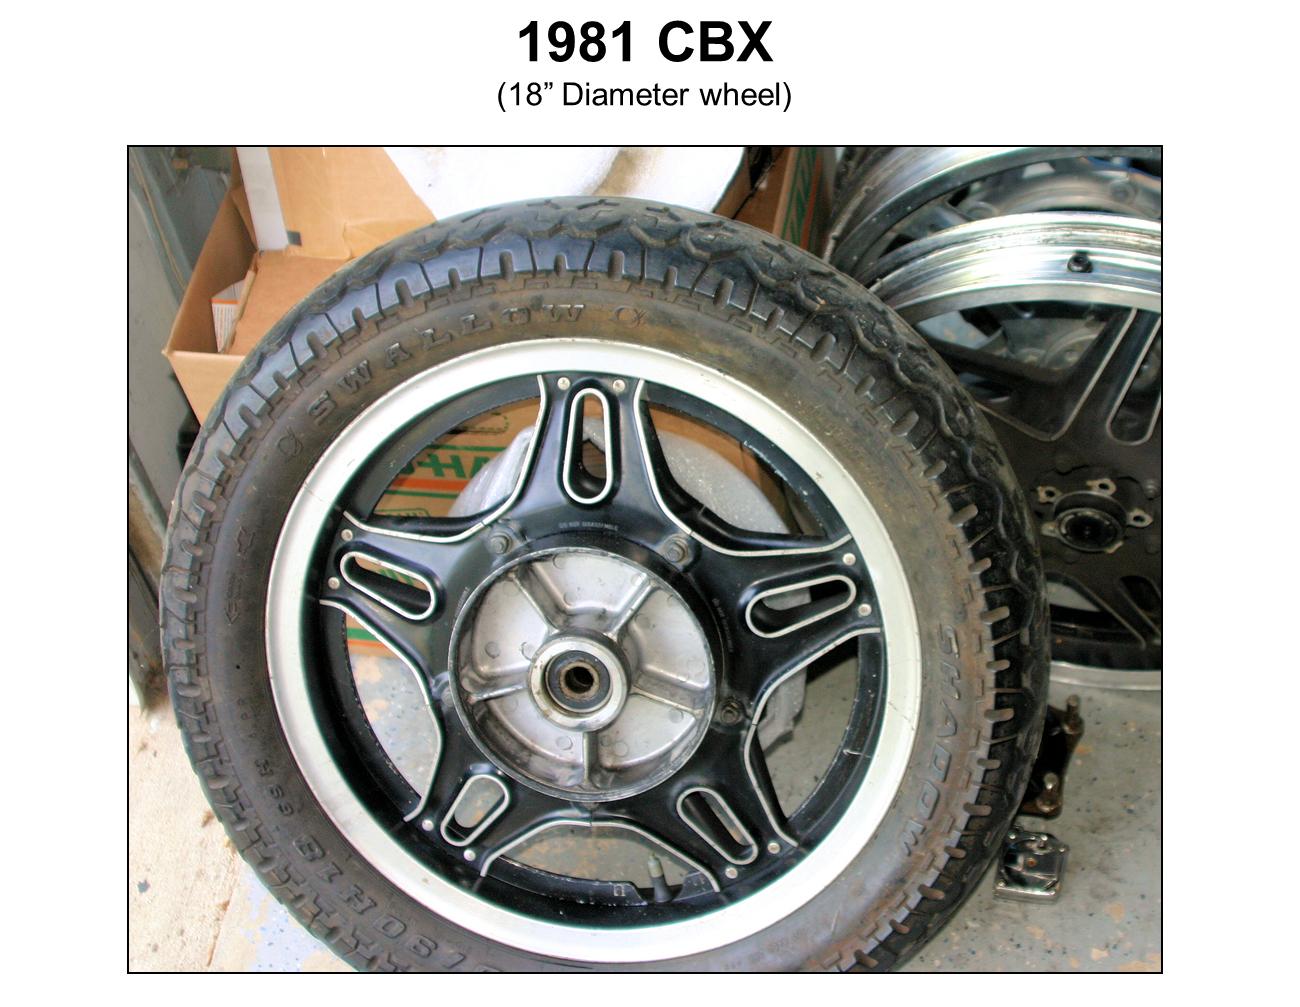 Hondahawkgt moreover D Gl I Few Upgrades Bring Into S Cbx Rear Wheel as well Honda Nt Hawk Gt together with Honda Nt Hawk Gt L Usa California Pedal Mediumhu F E together with Honda Nt Hawk Gt. on 1990 honda hawk gt 650